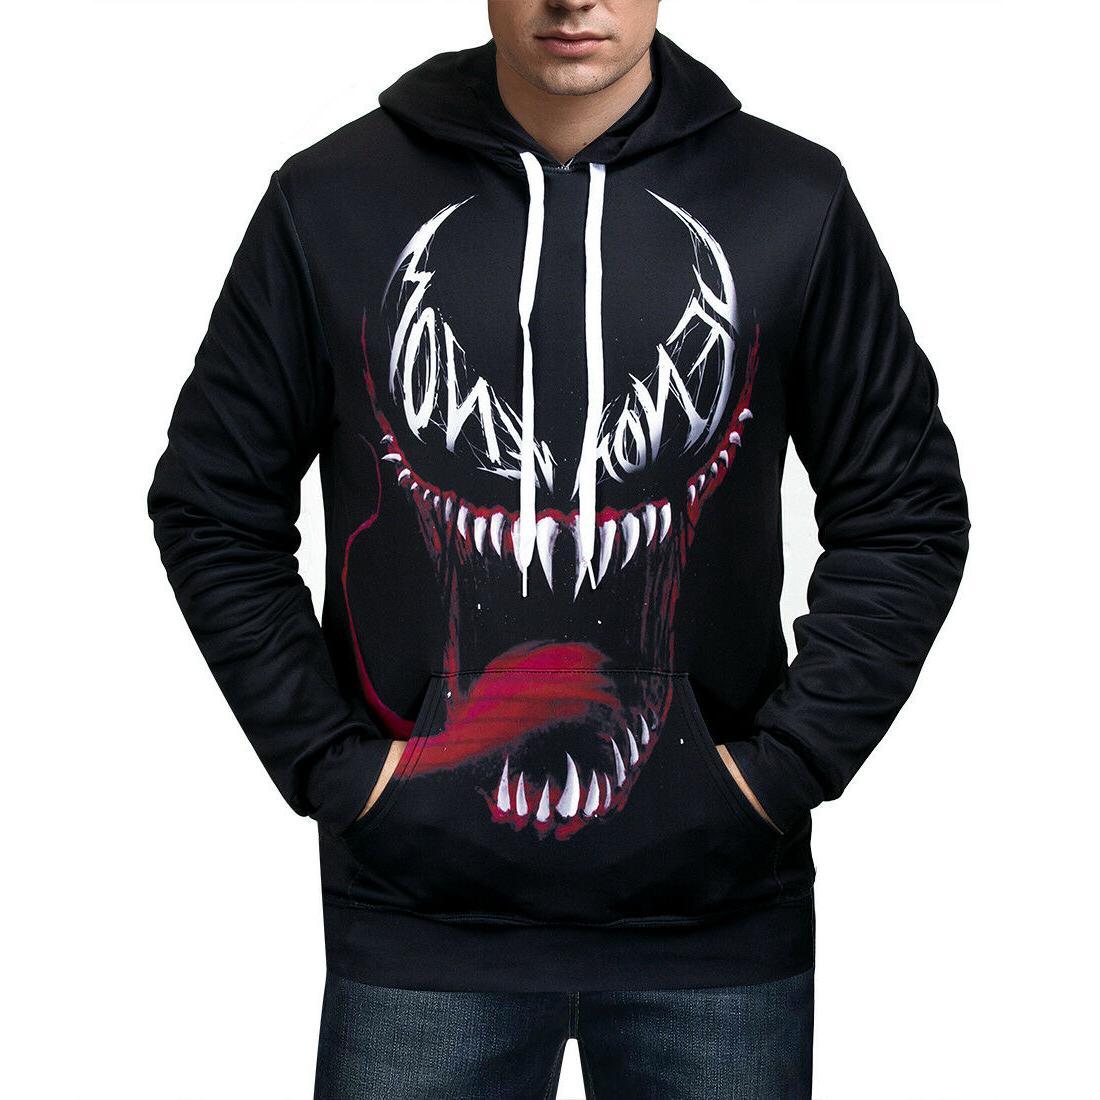 Women/Men Hoodies Print Venom Sweater